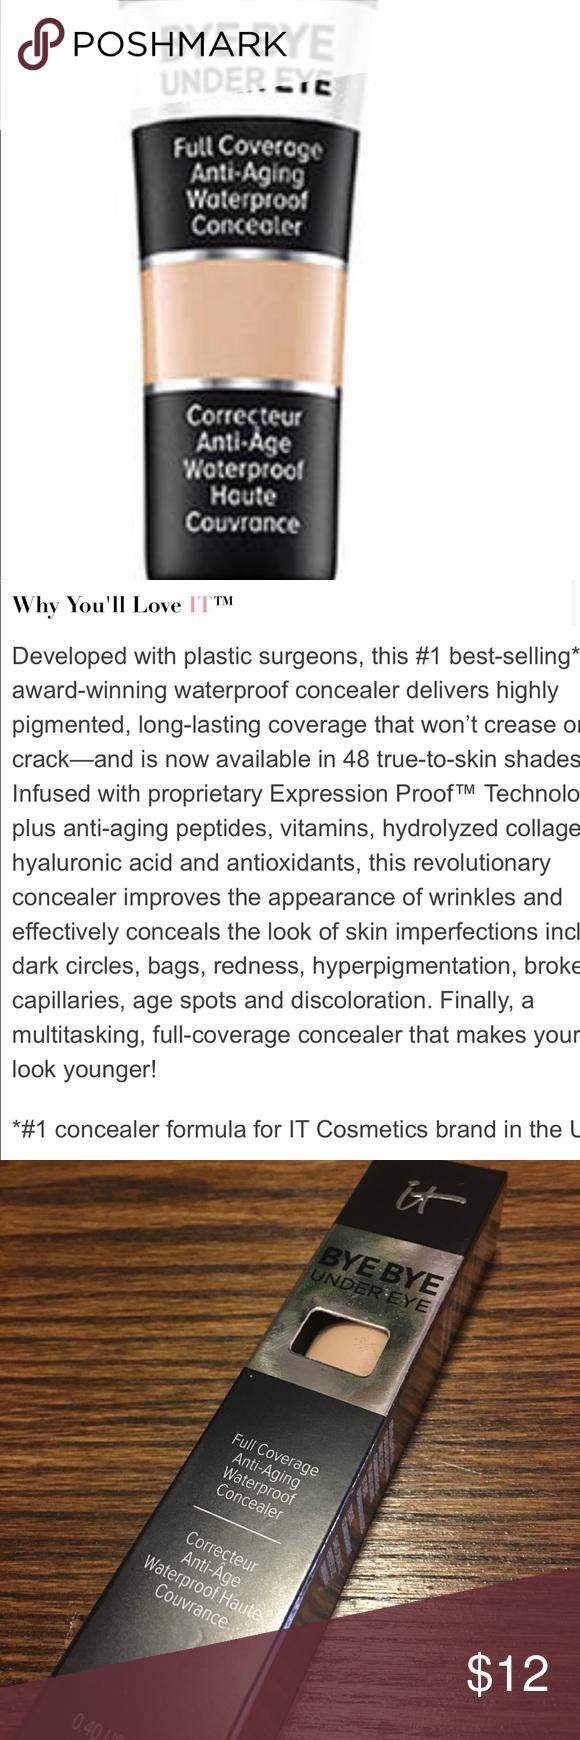 It cosmetics bye bye under eye concealer Under eye